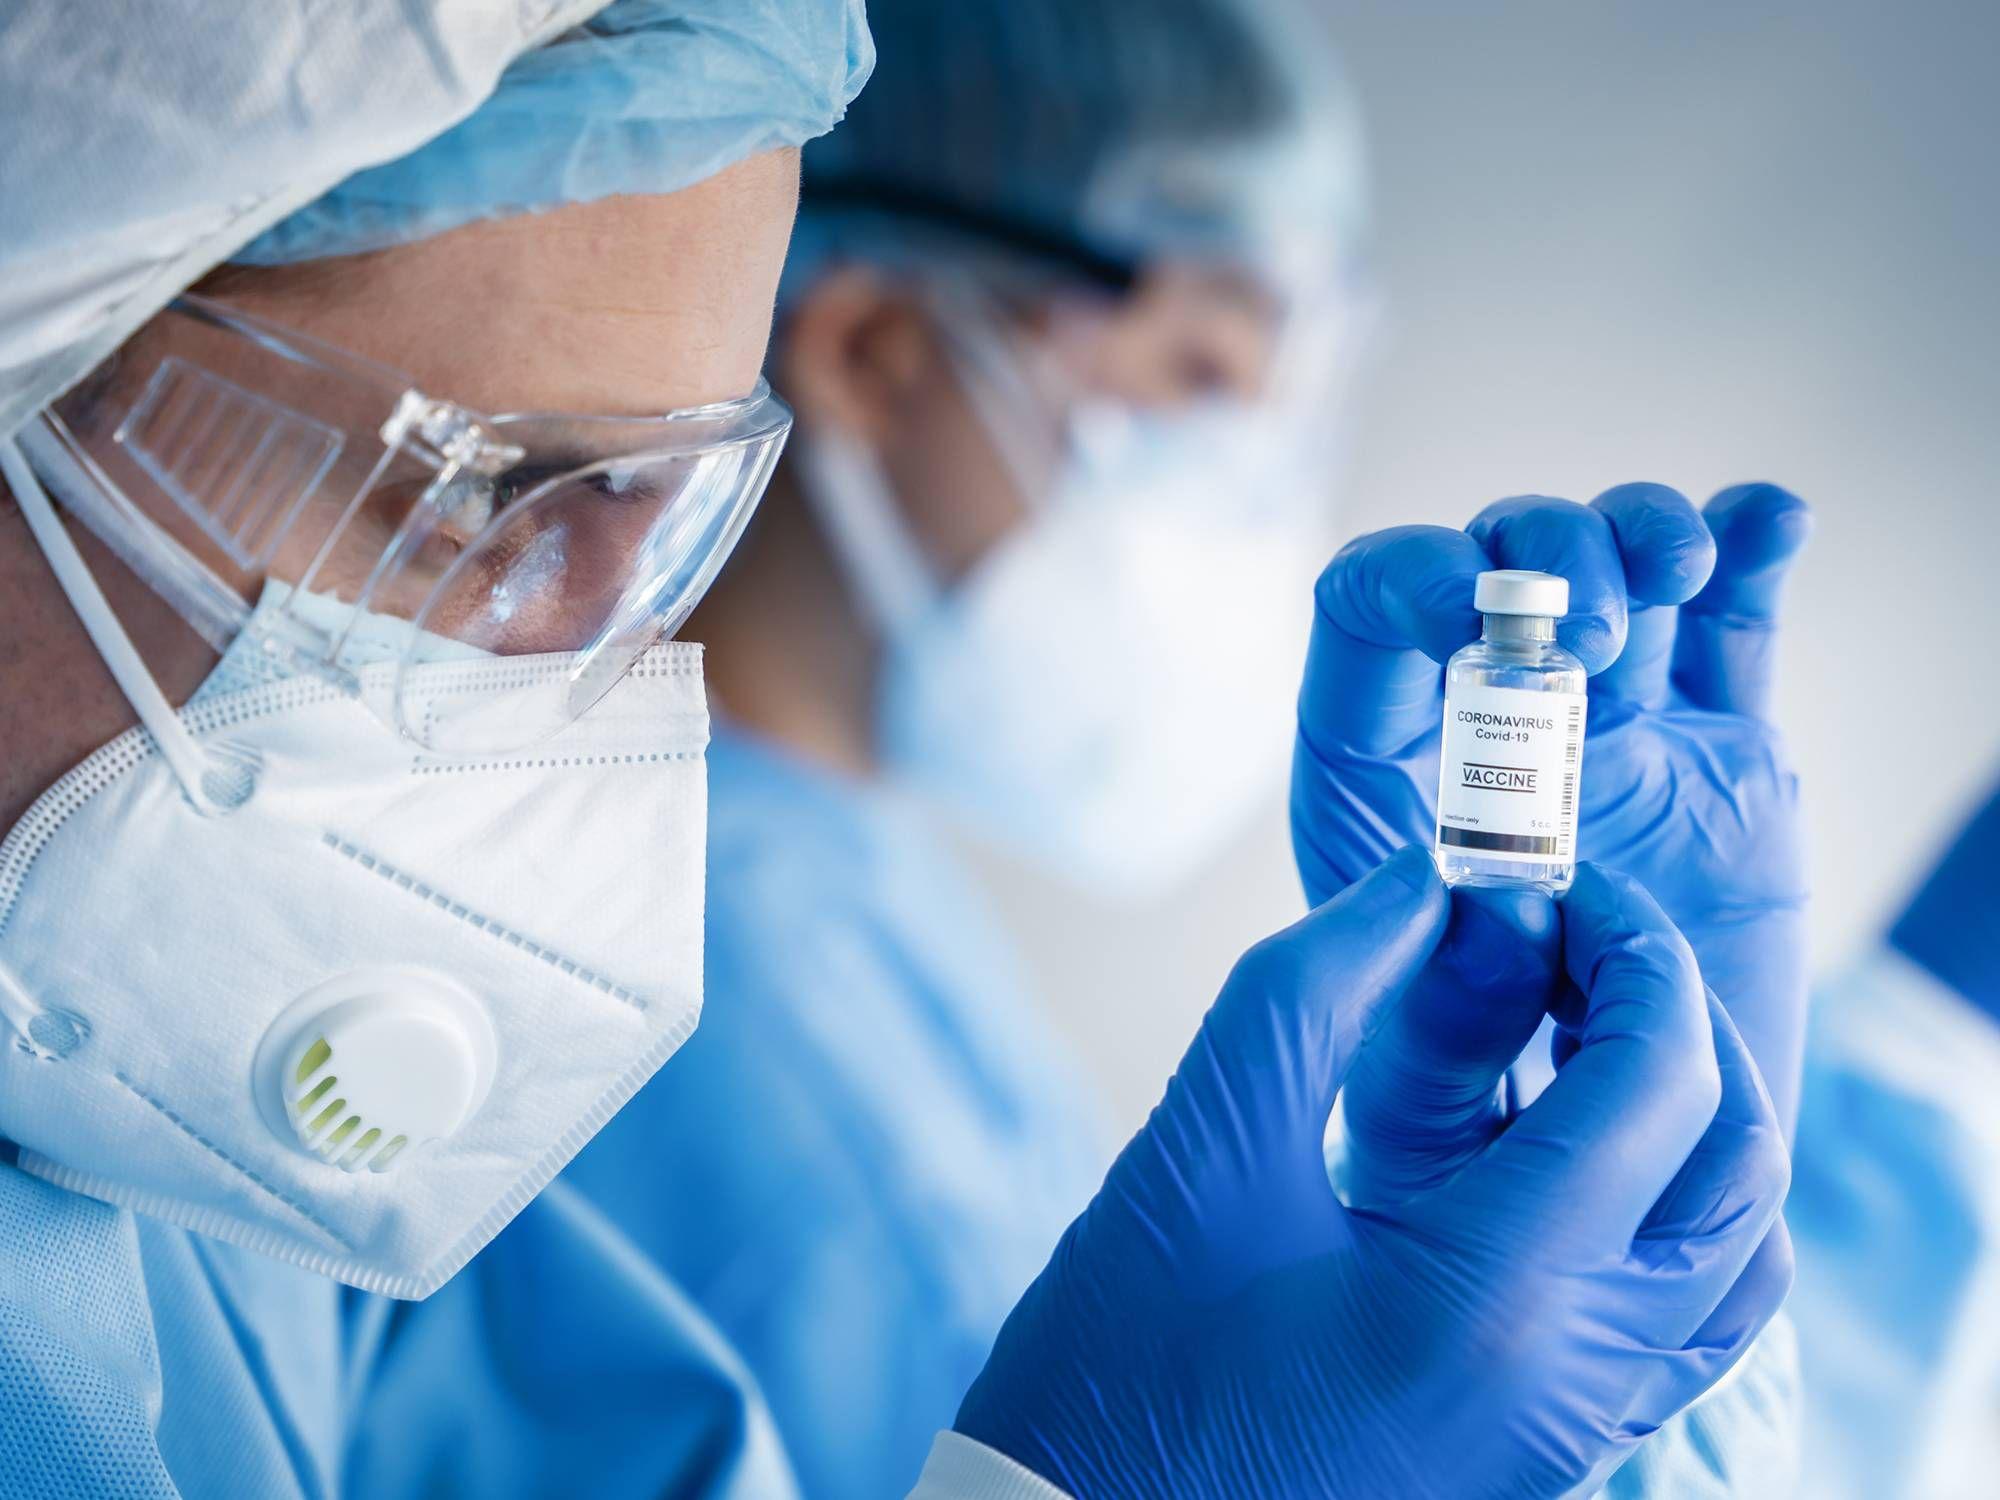 testo Saveris生命科学环境监测系统在健康与卫生领域的应用